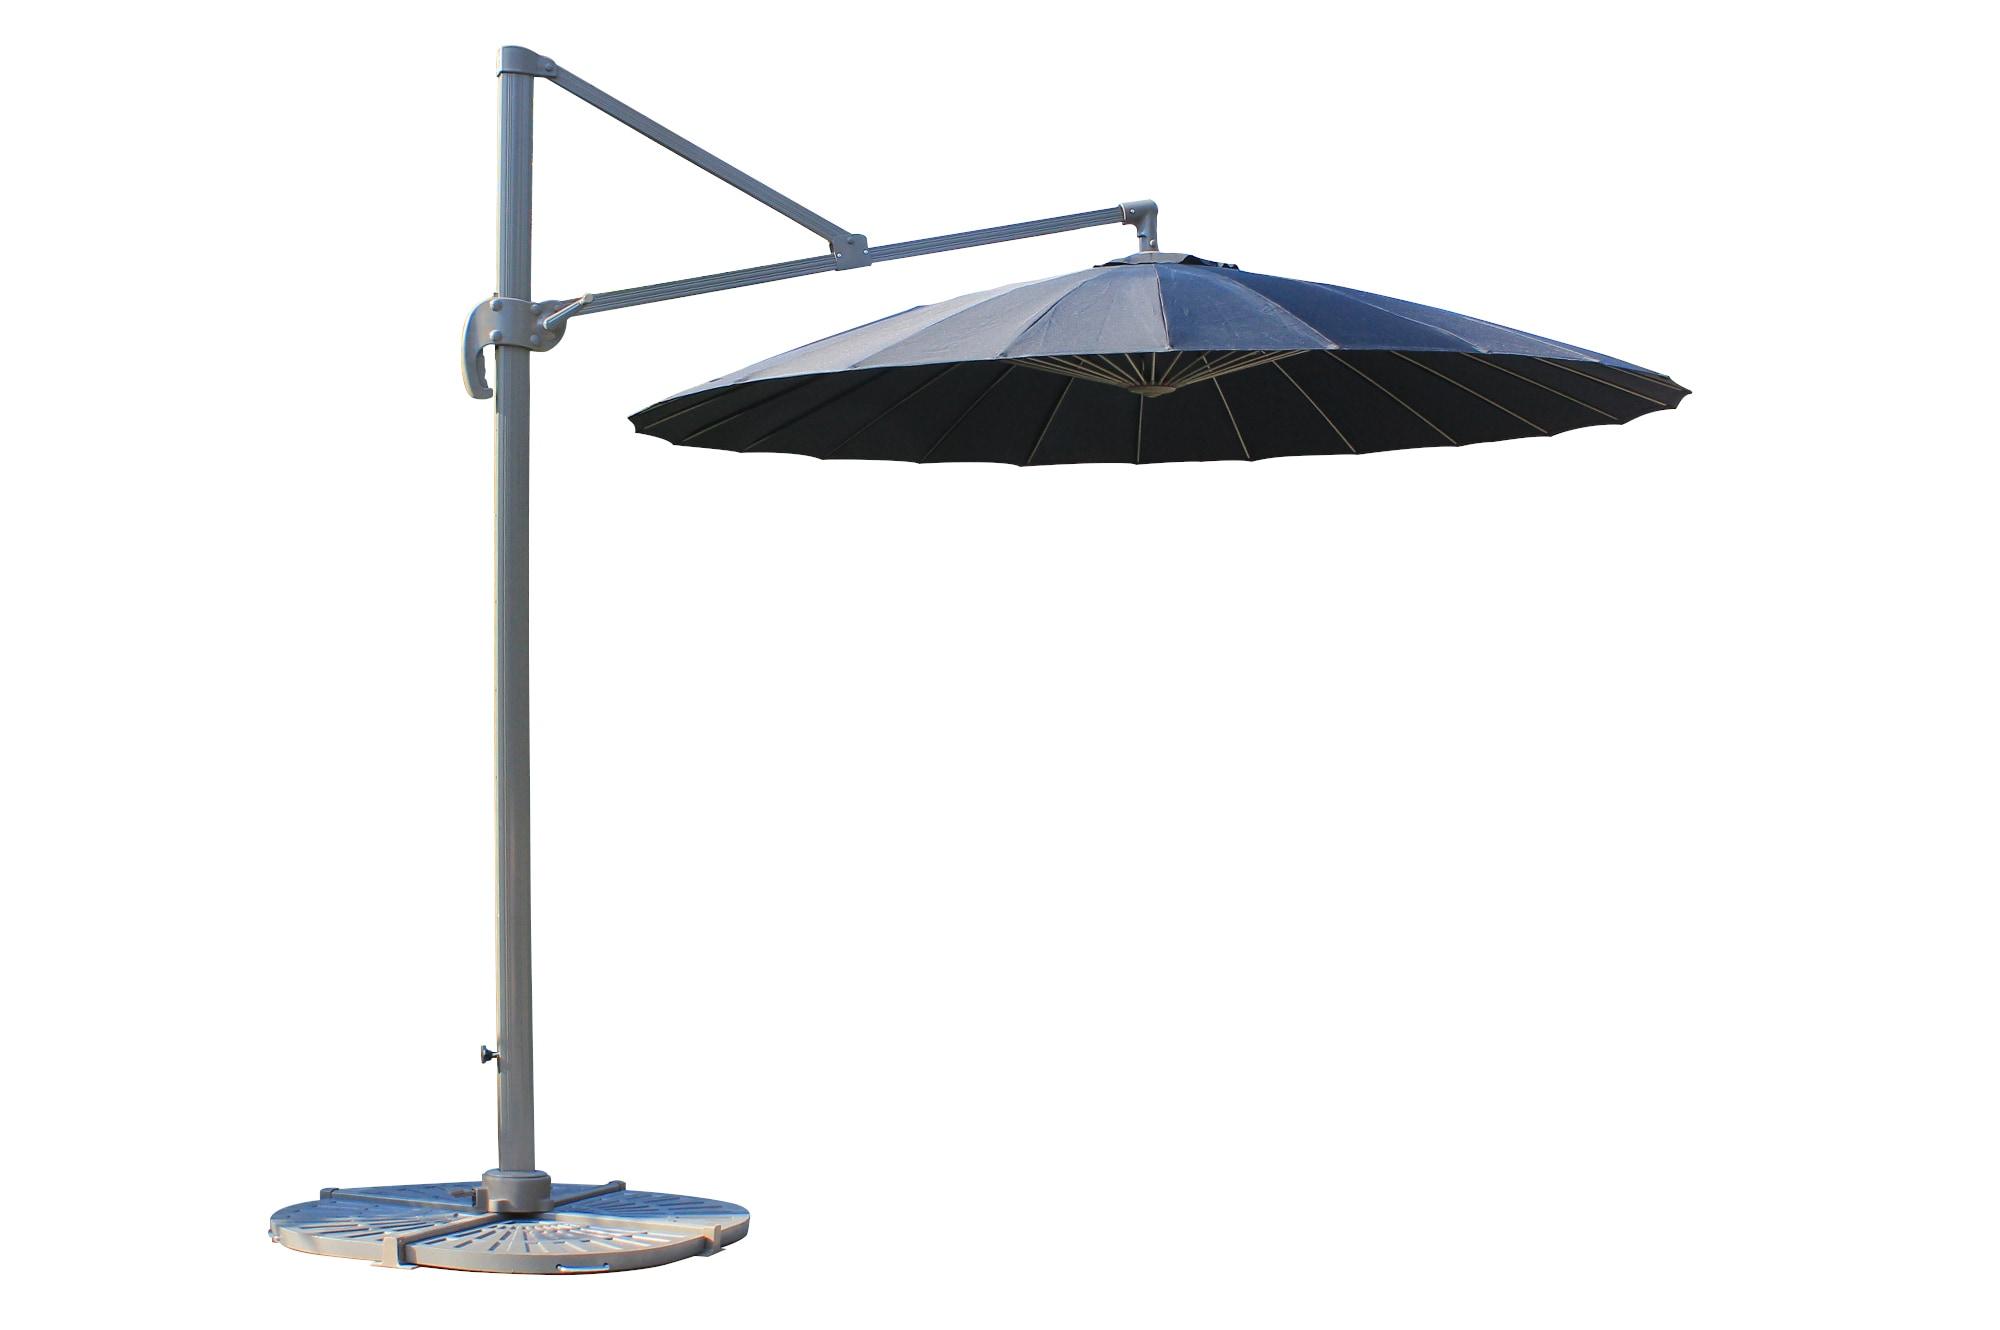 9 ft Round Fiberglass Hanging Umbrella - 360 degree swivel - Black Shade & Cooling Offset Patio Umbrellas 0